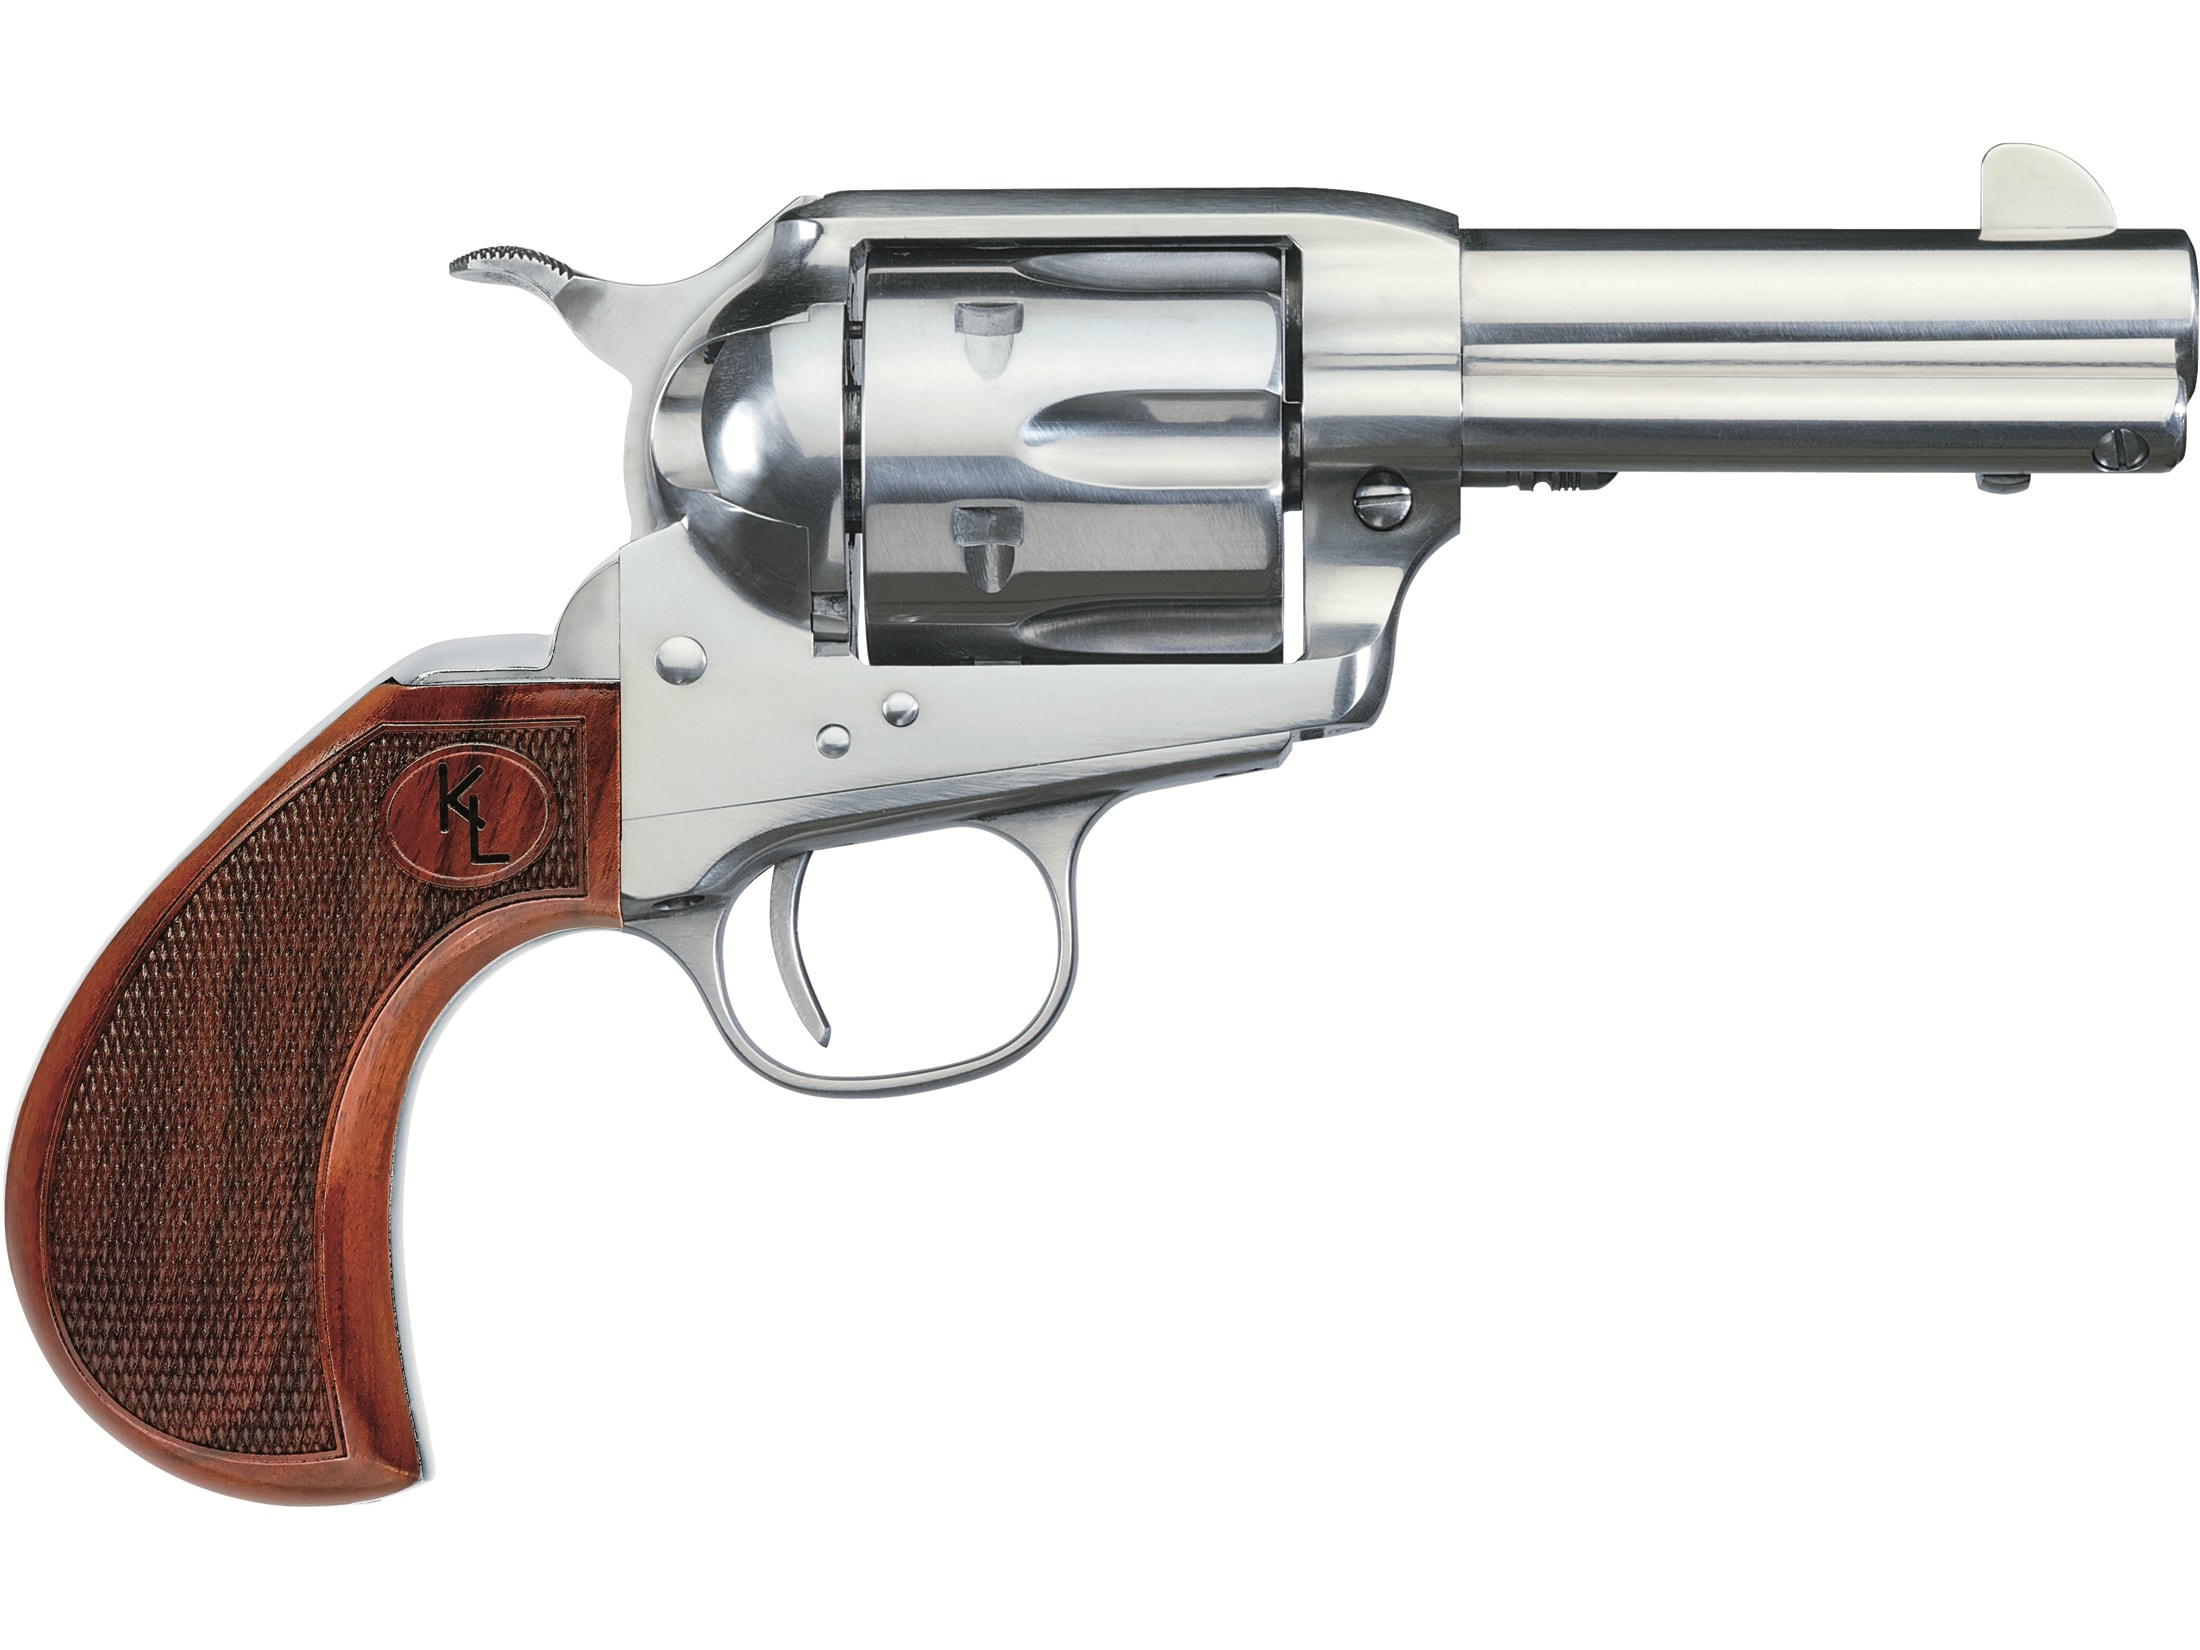 "Image of Uberti 1873 Short Stroke CMS KL S/S 45 Colt (Long Colt) Revolver 3.5"" Barrel"